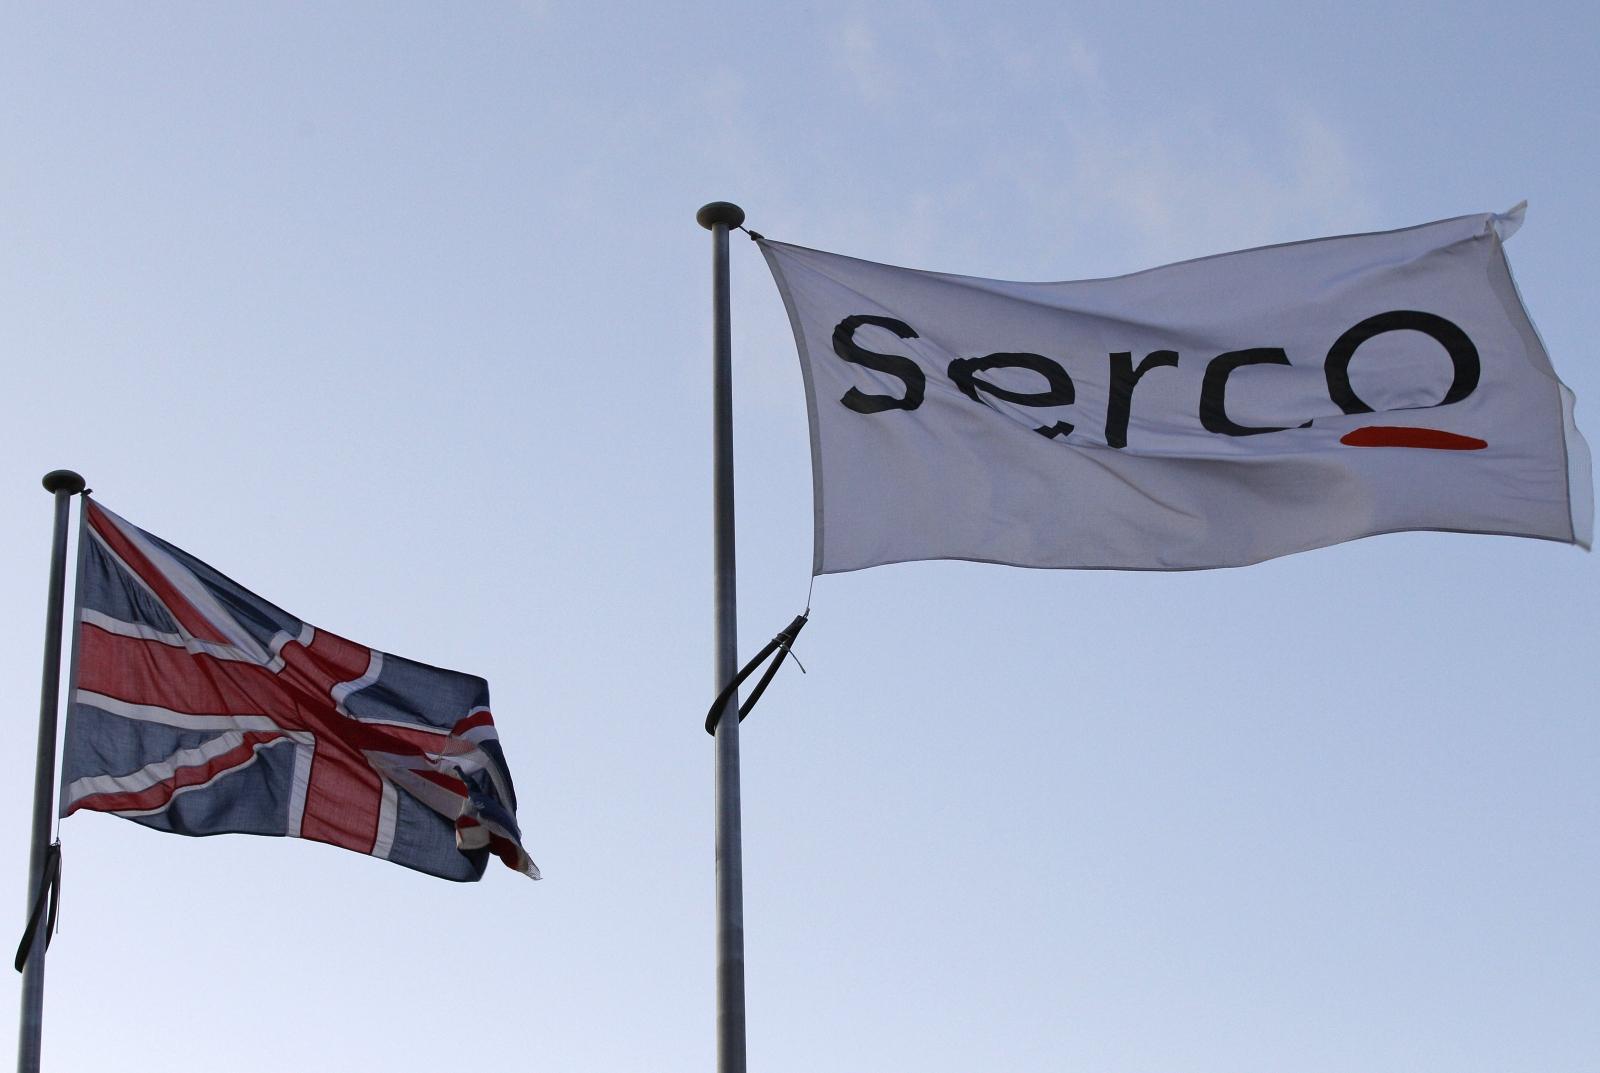 Serco logo on a flag